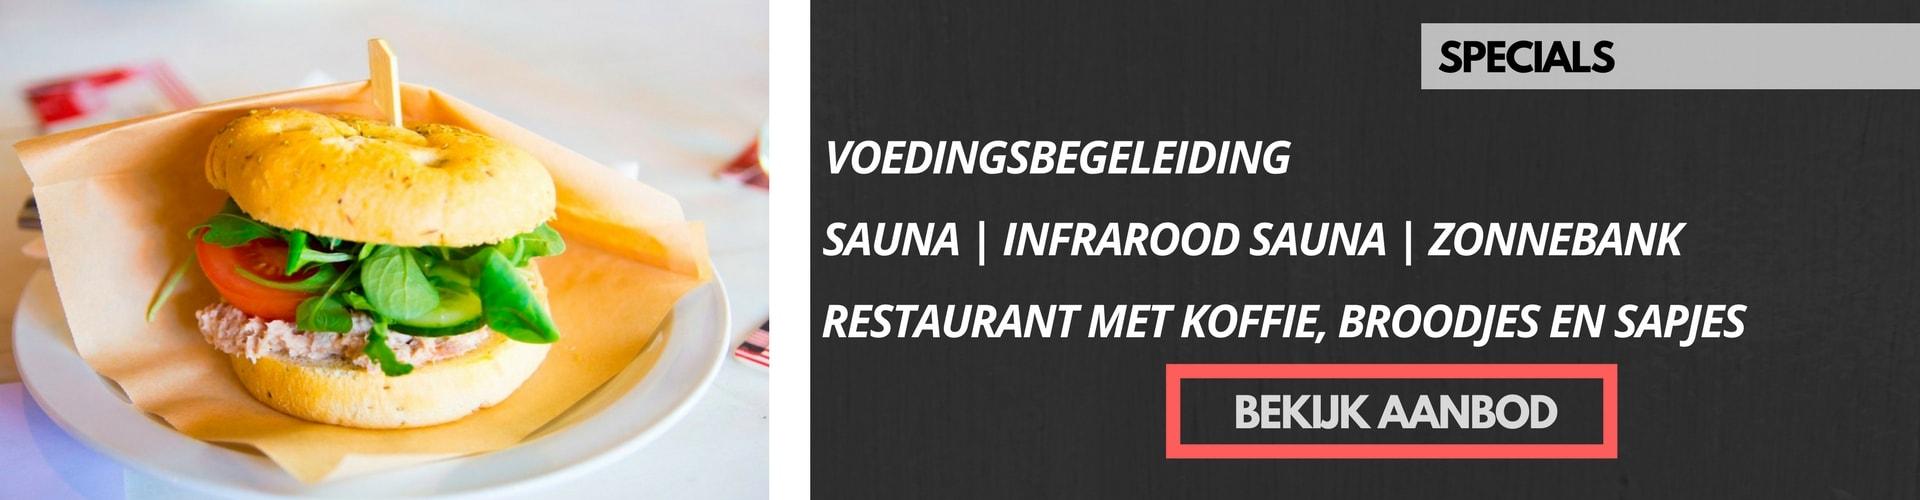 Gezonde voeding Venlo